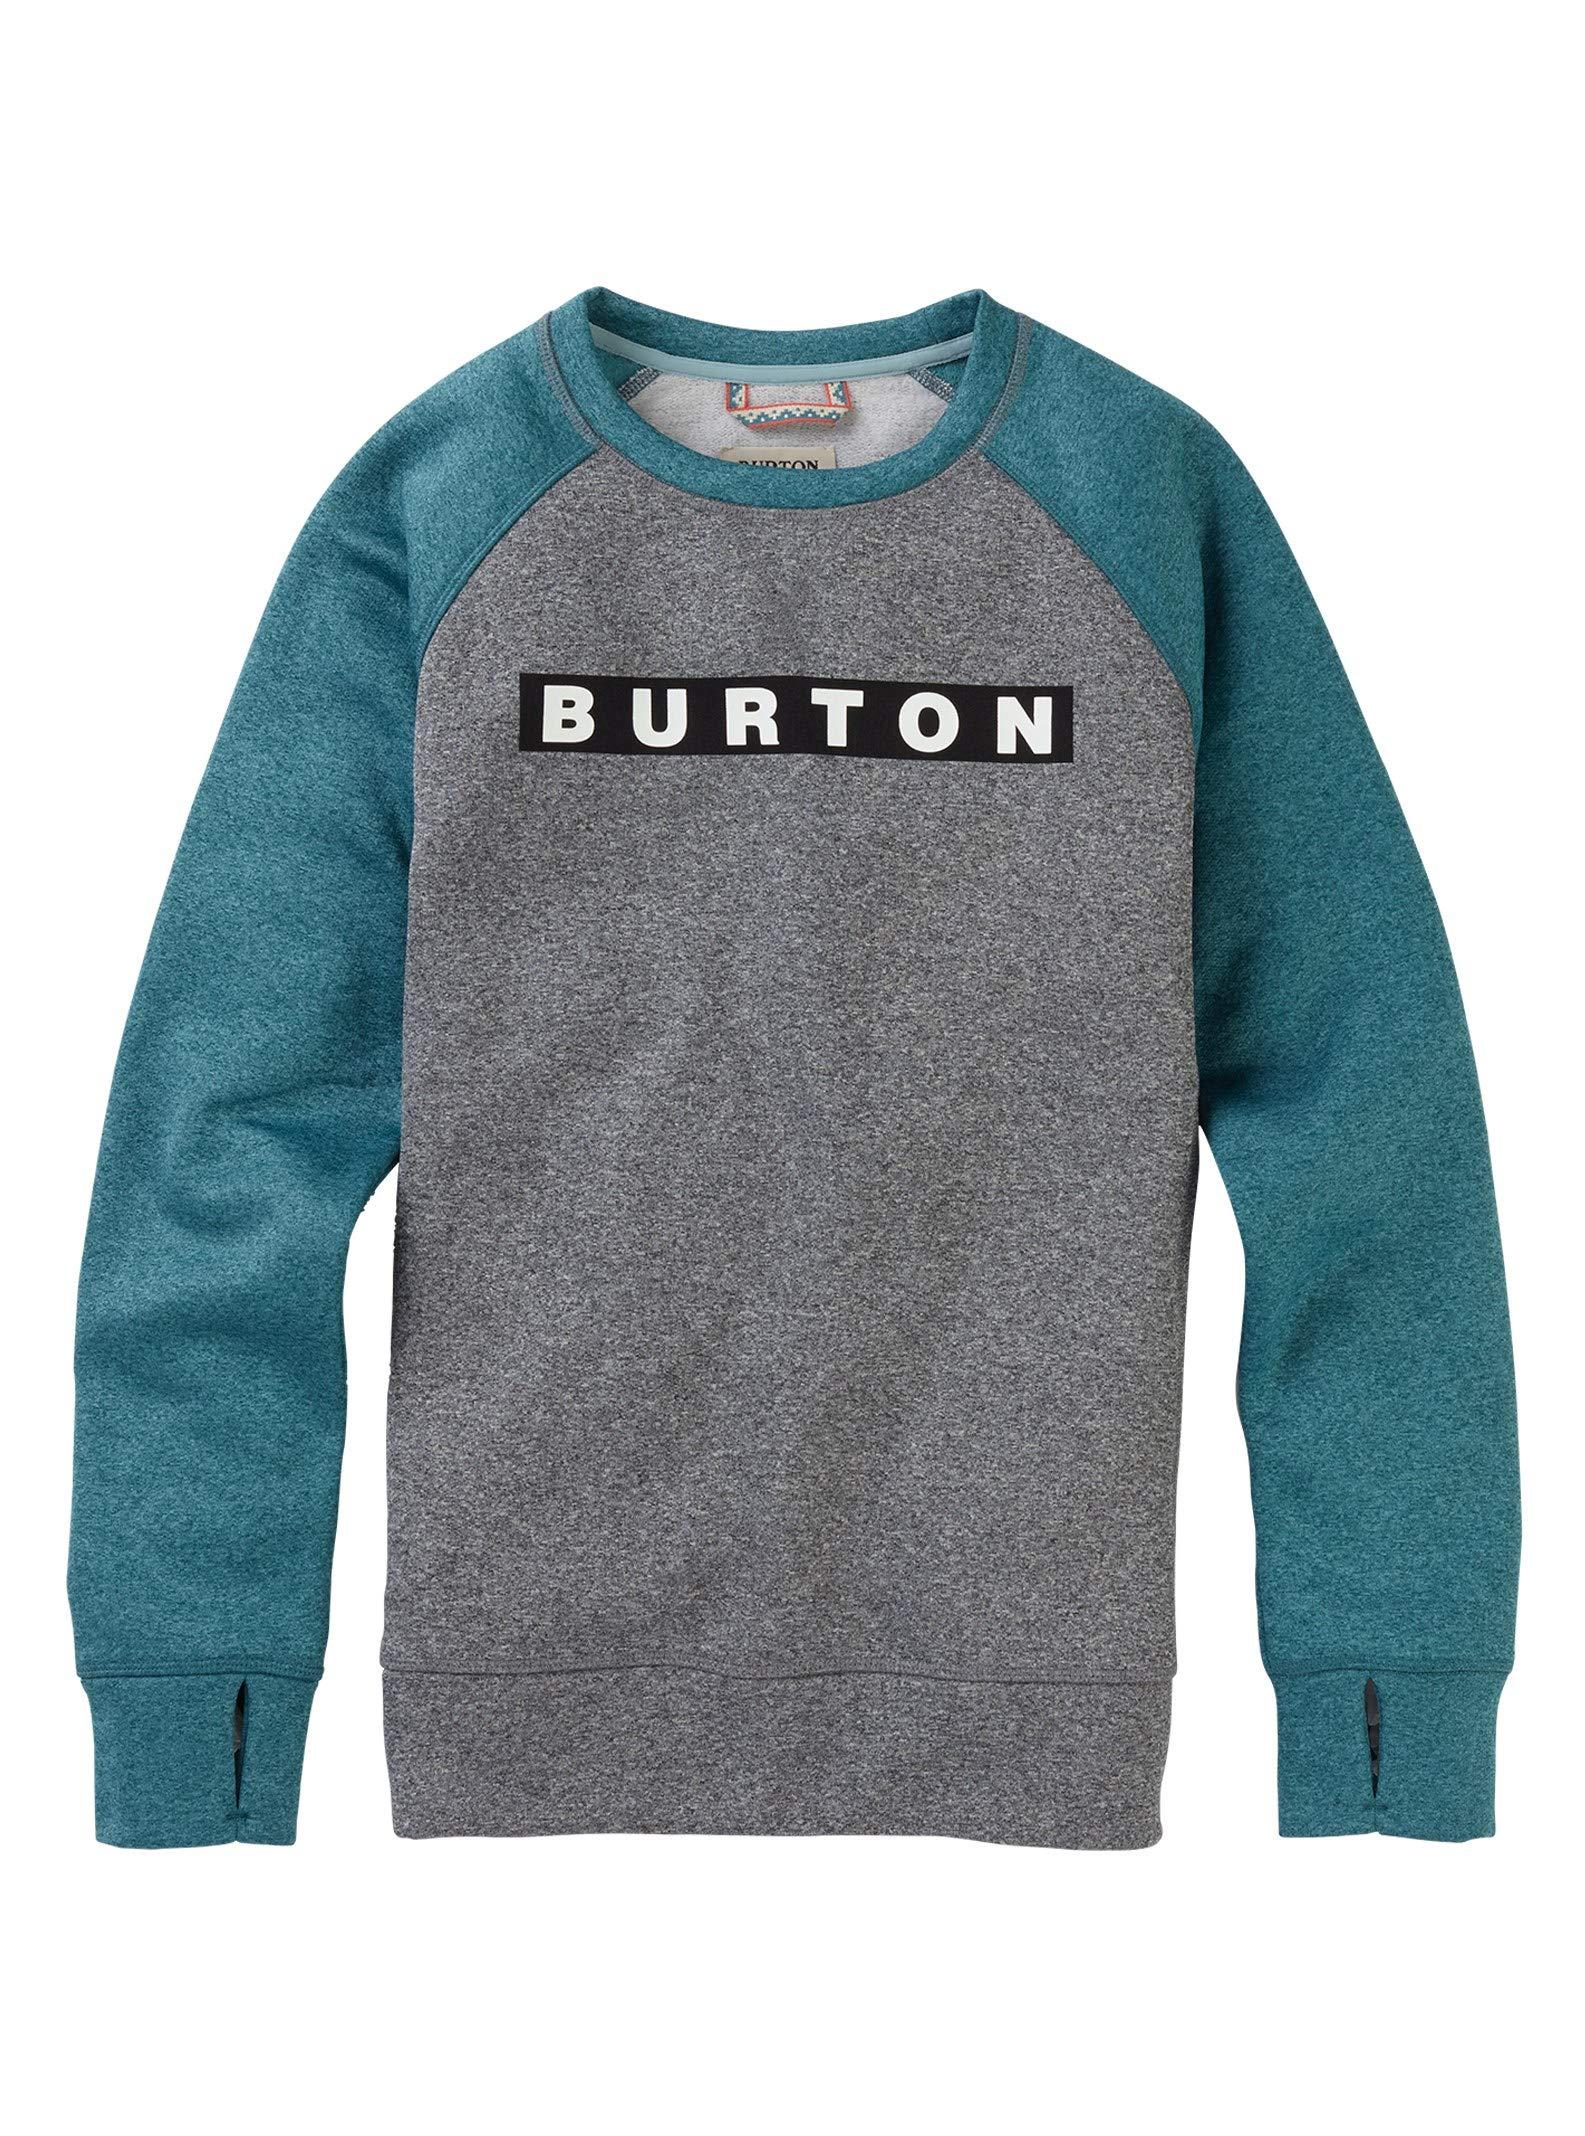 Burton Women's Oak Crew Sweatshirt, Gray Heather/Hydro Heather, Large by Burton